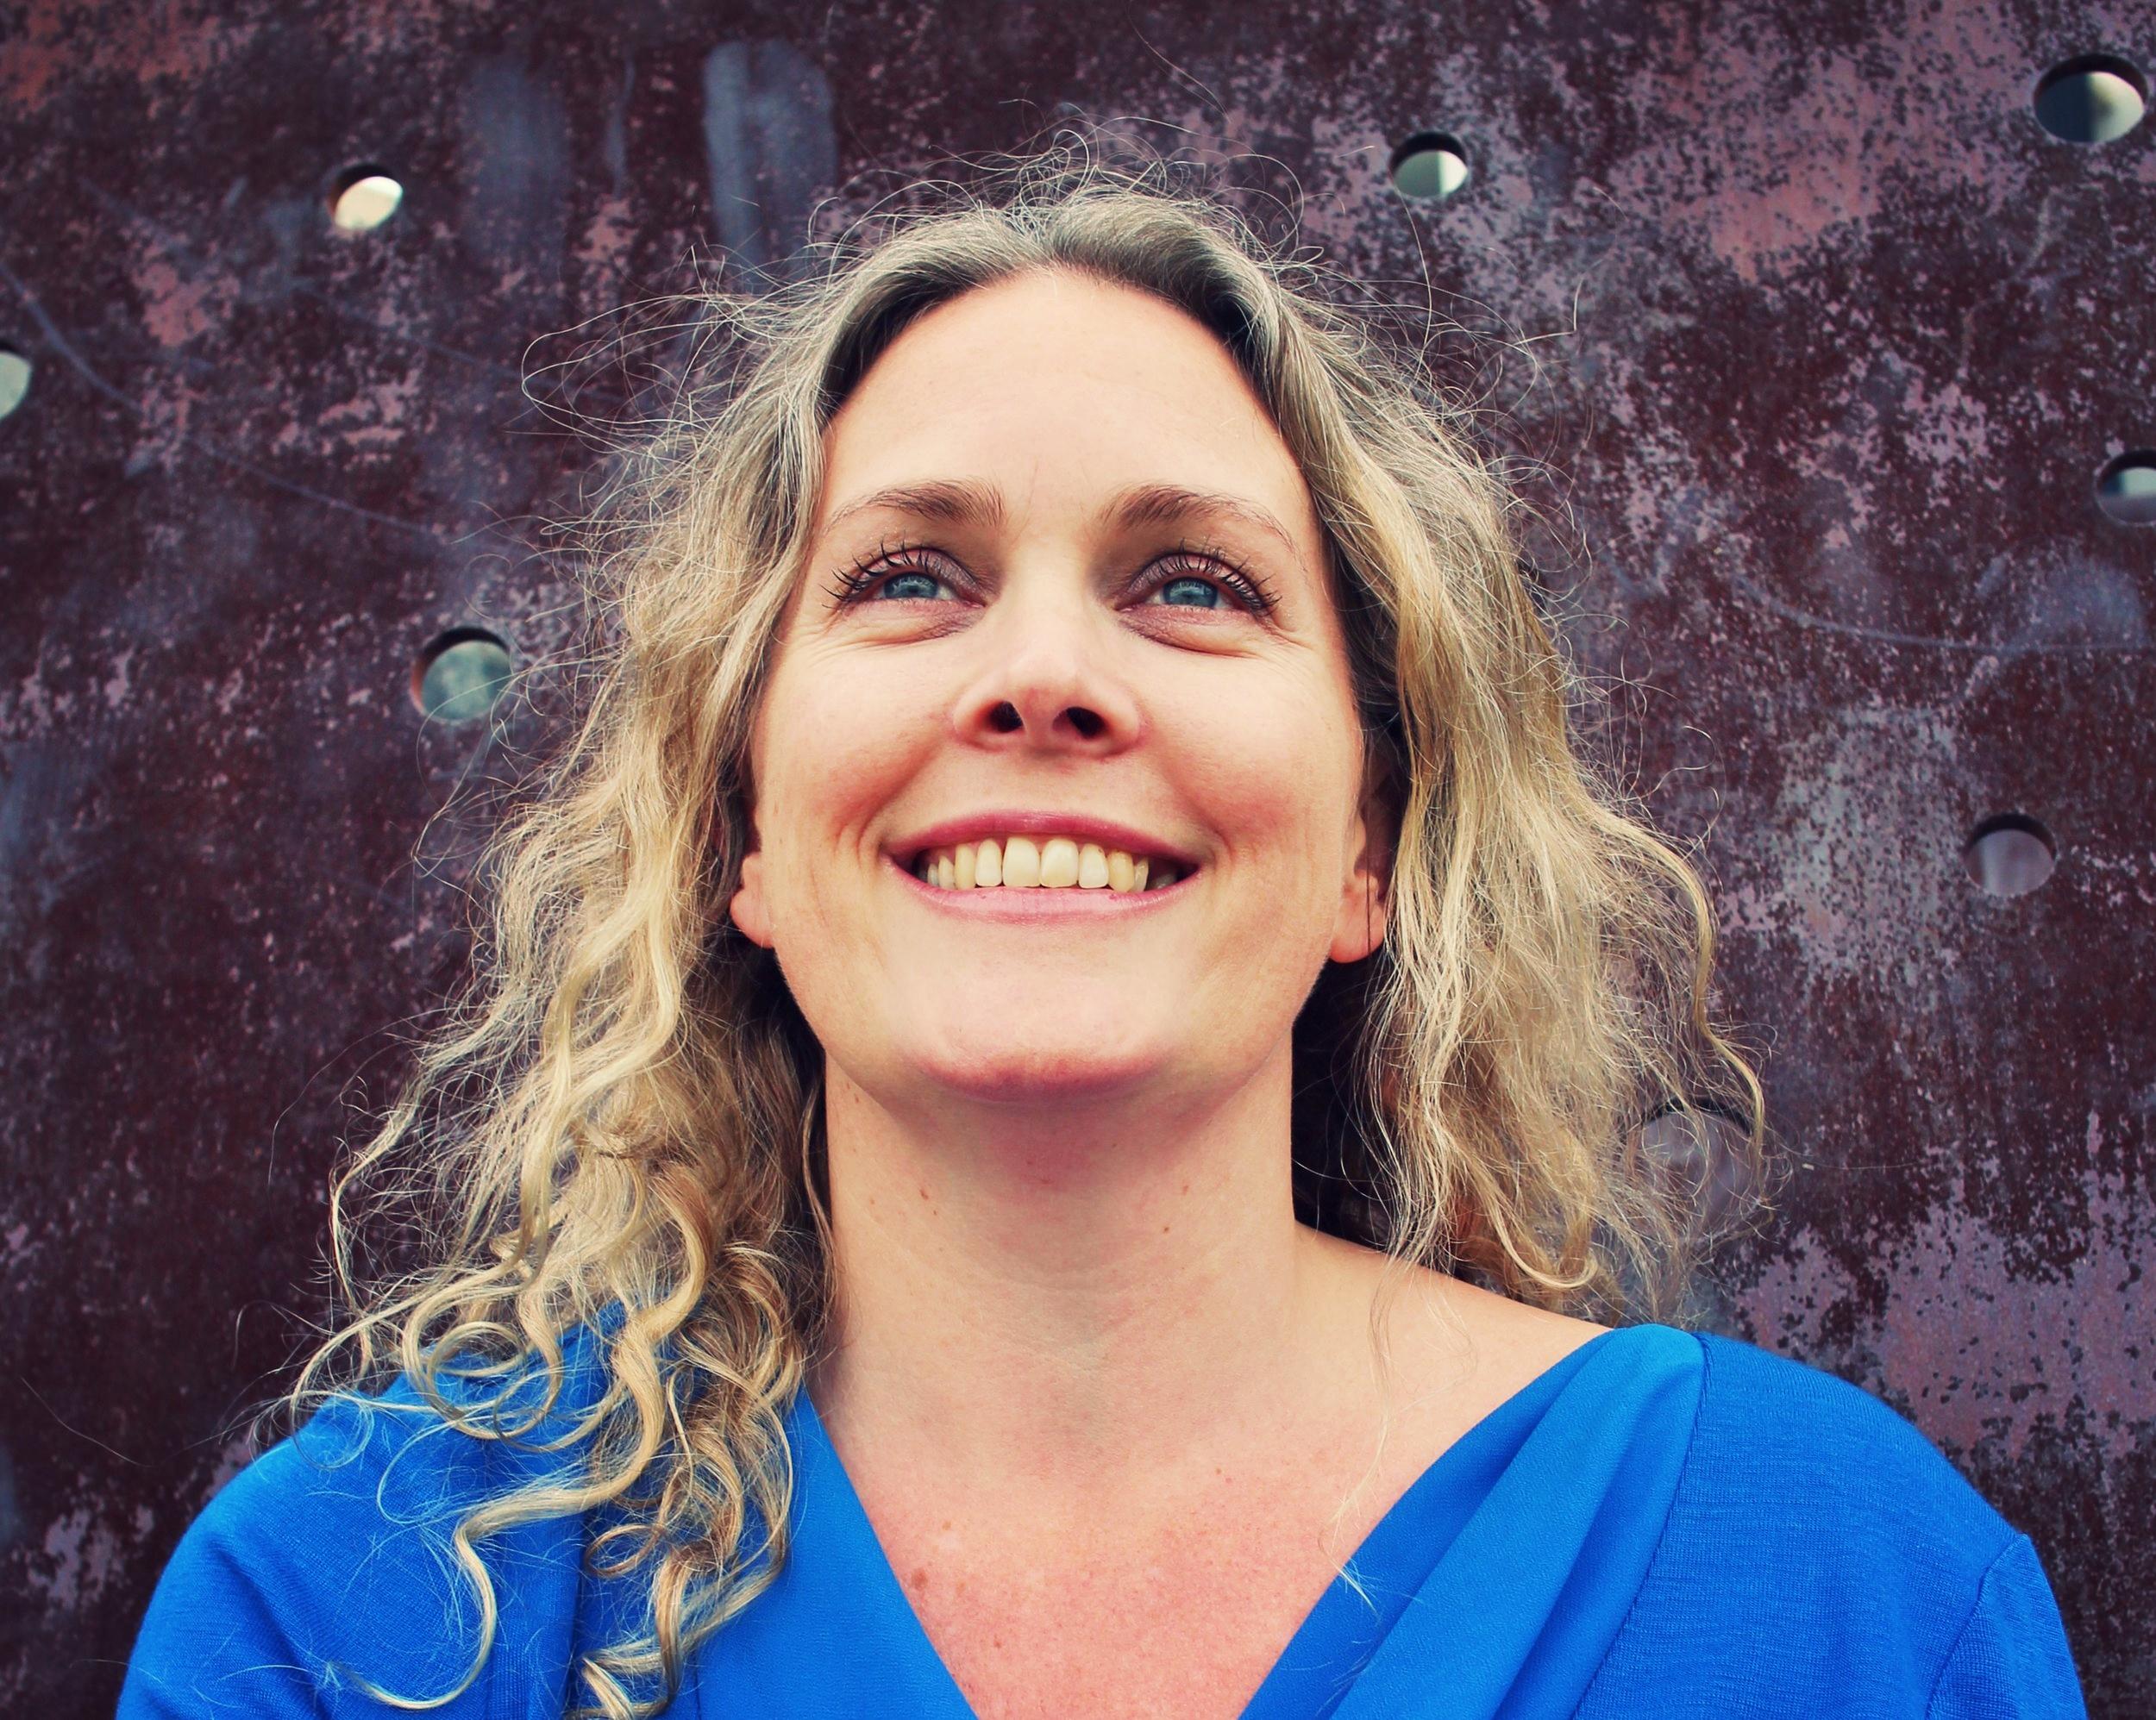 Small business coach Sue McLachlan helps female entrepreneurs grow their business